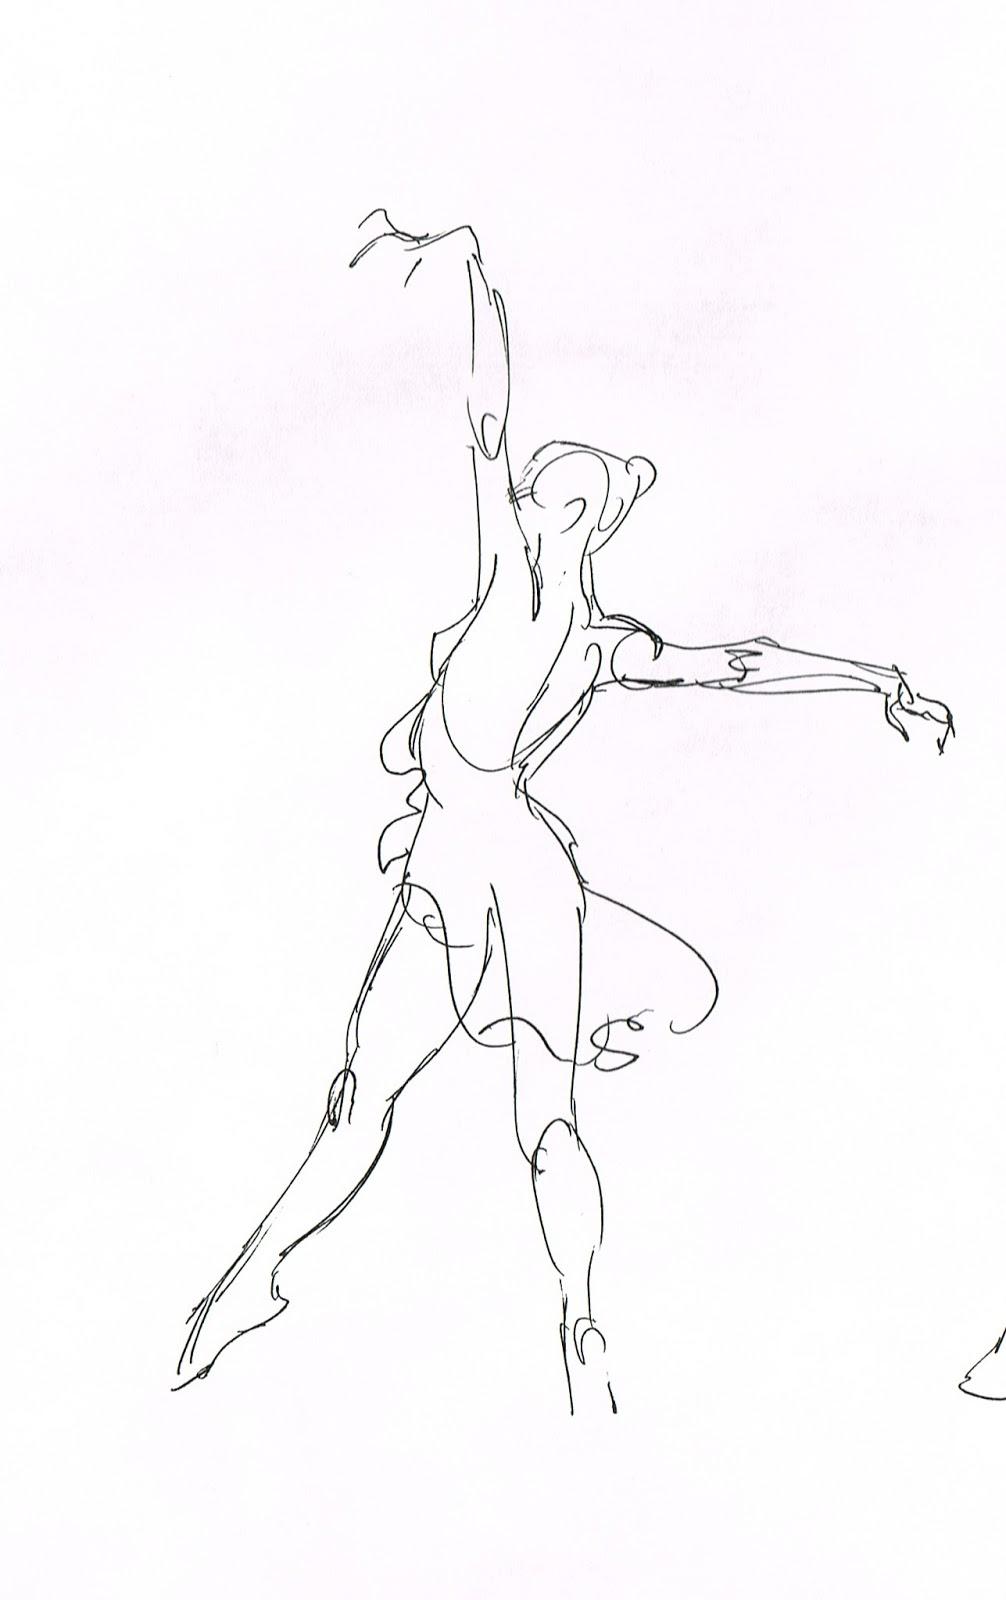 Ballerina Figure Drawing At Getdrawings